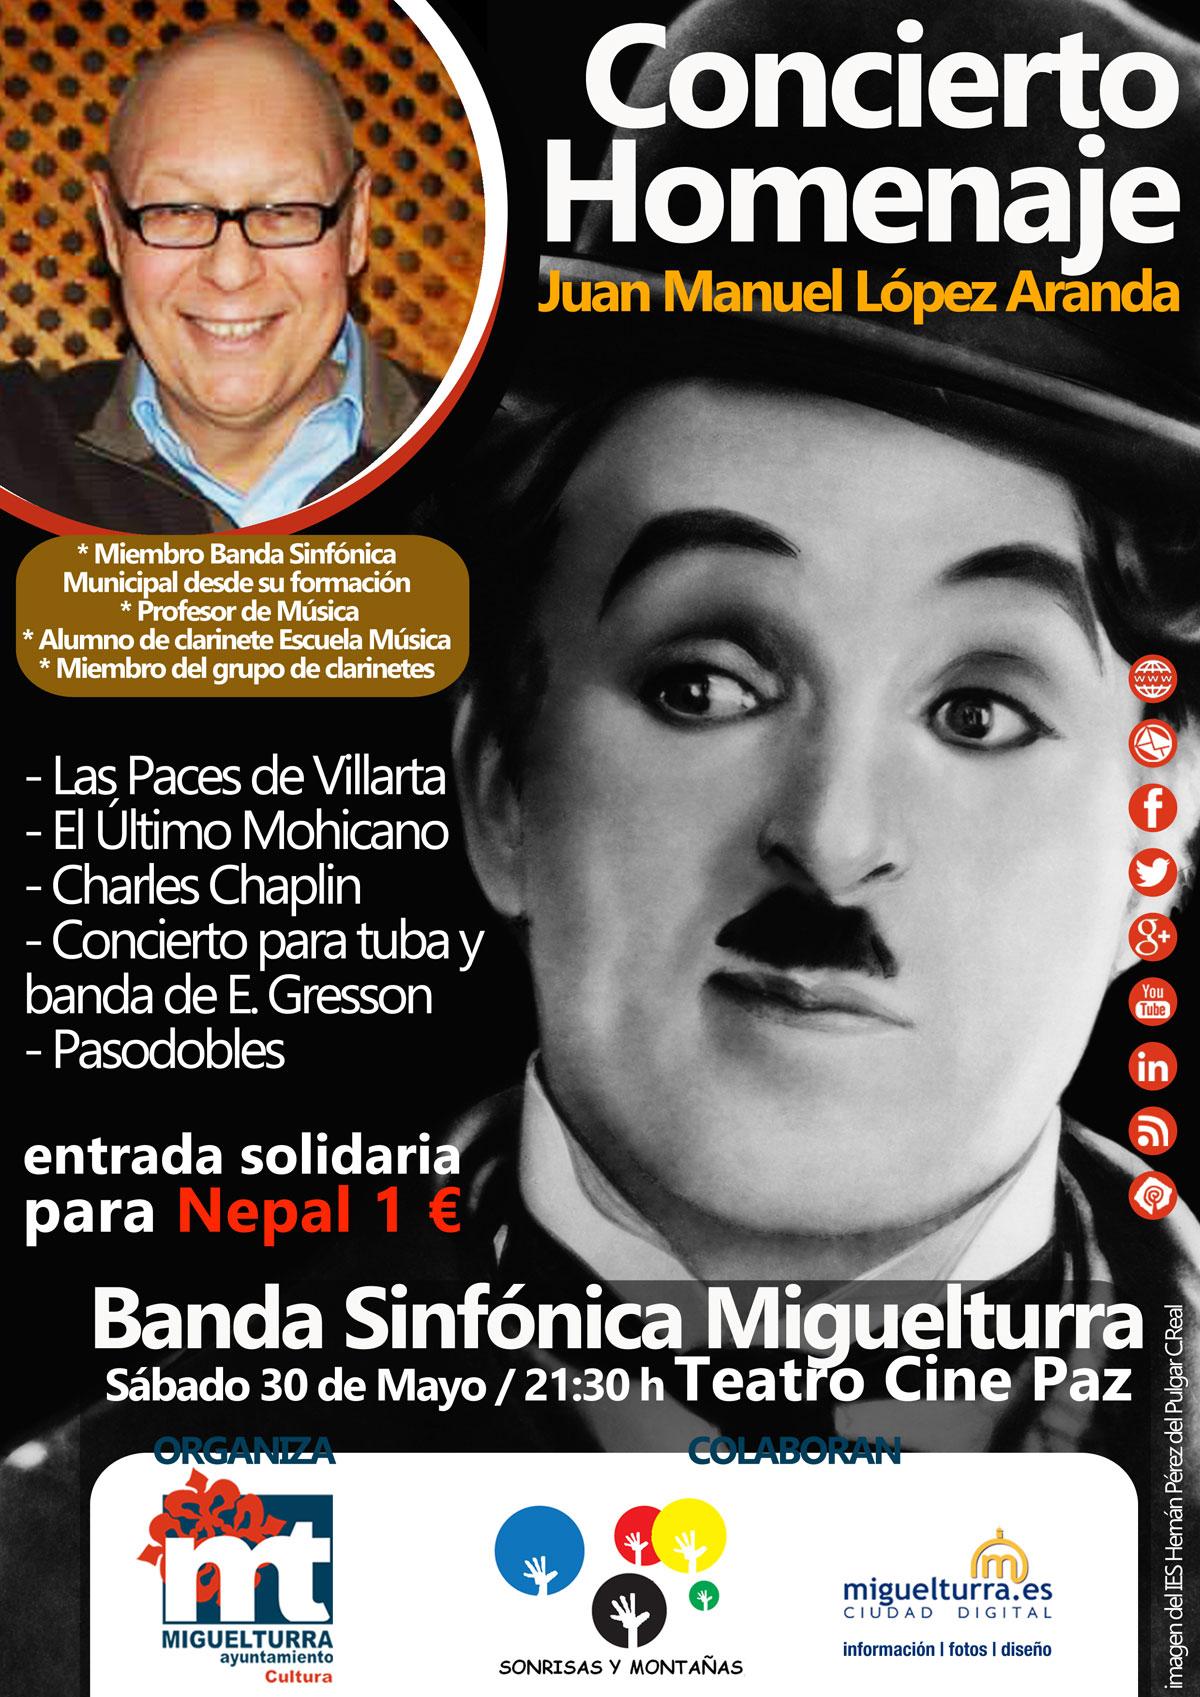 Concierto homenaje de la Banda Sinfónica Municipal de Miguelturra a Juan Manuel López Aranda